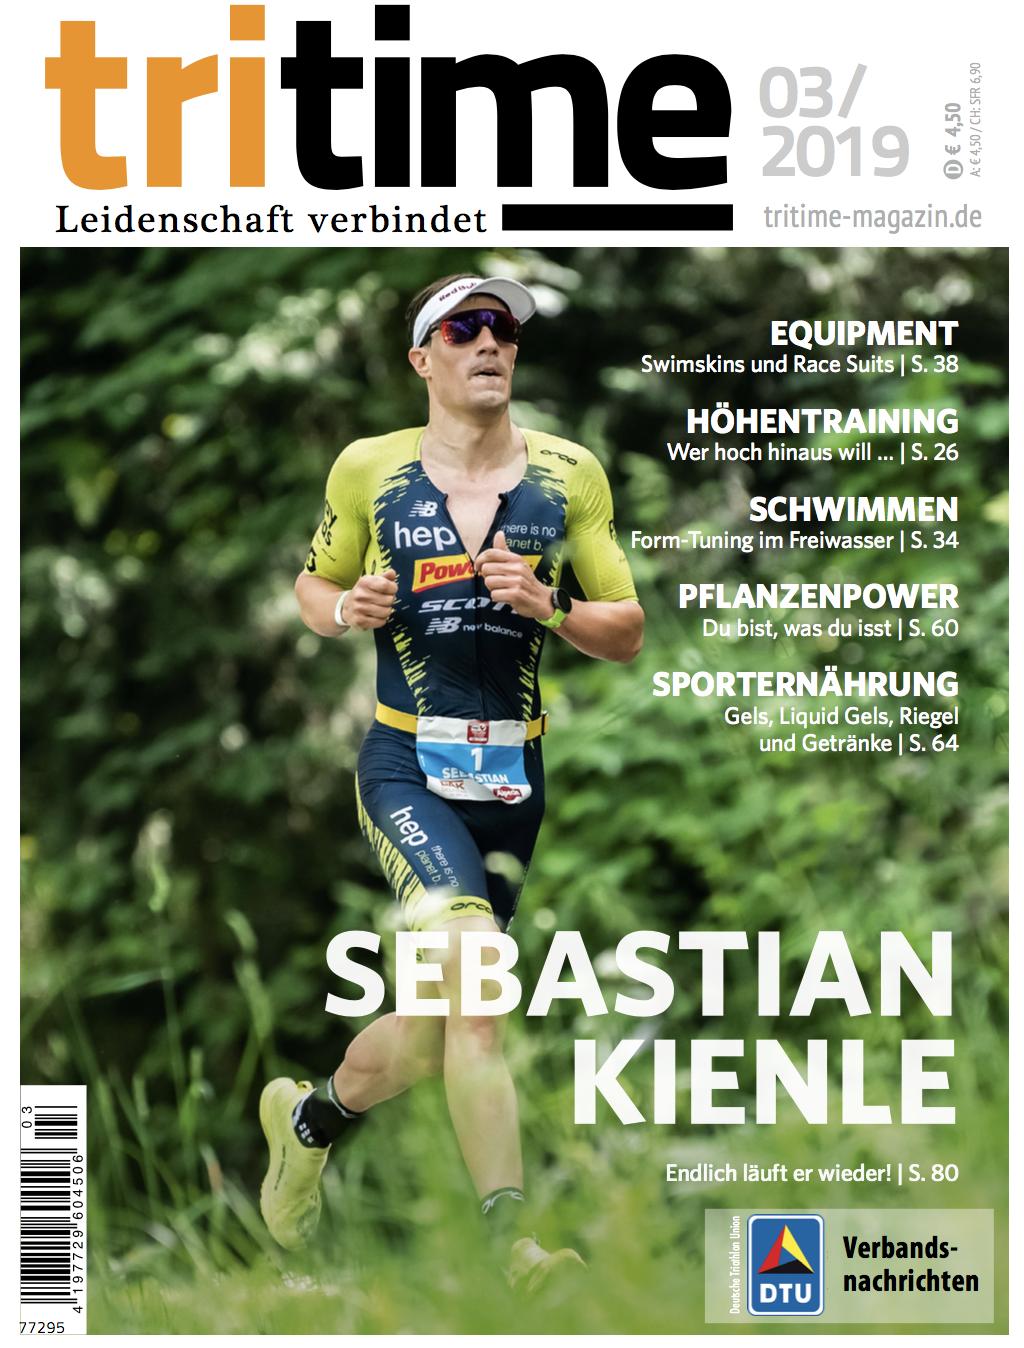 Titelbild tritime #52 |Sebastian Kienle, Sporternährung, Swimskins, Race Suits, Achillessehne, Veranstaltungen